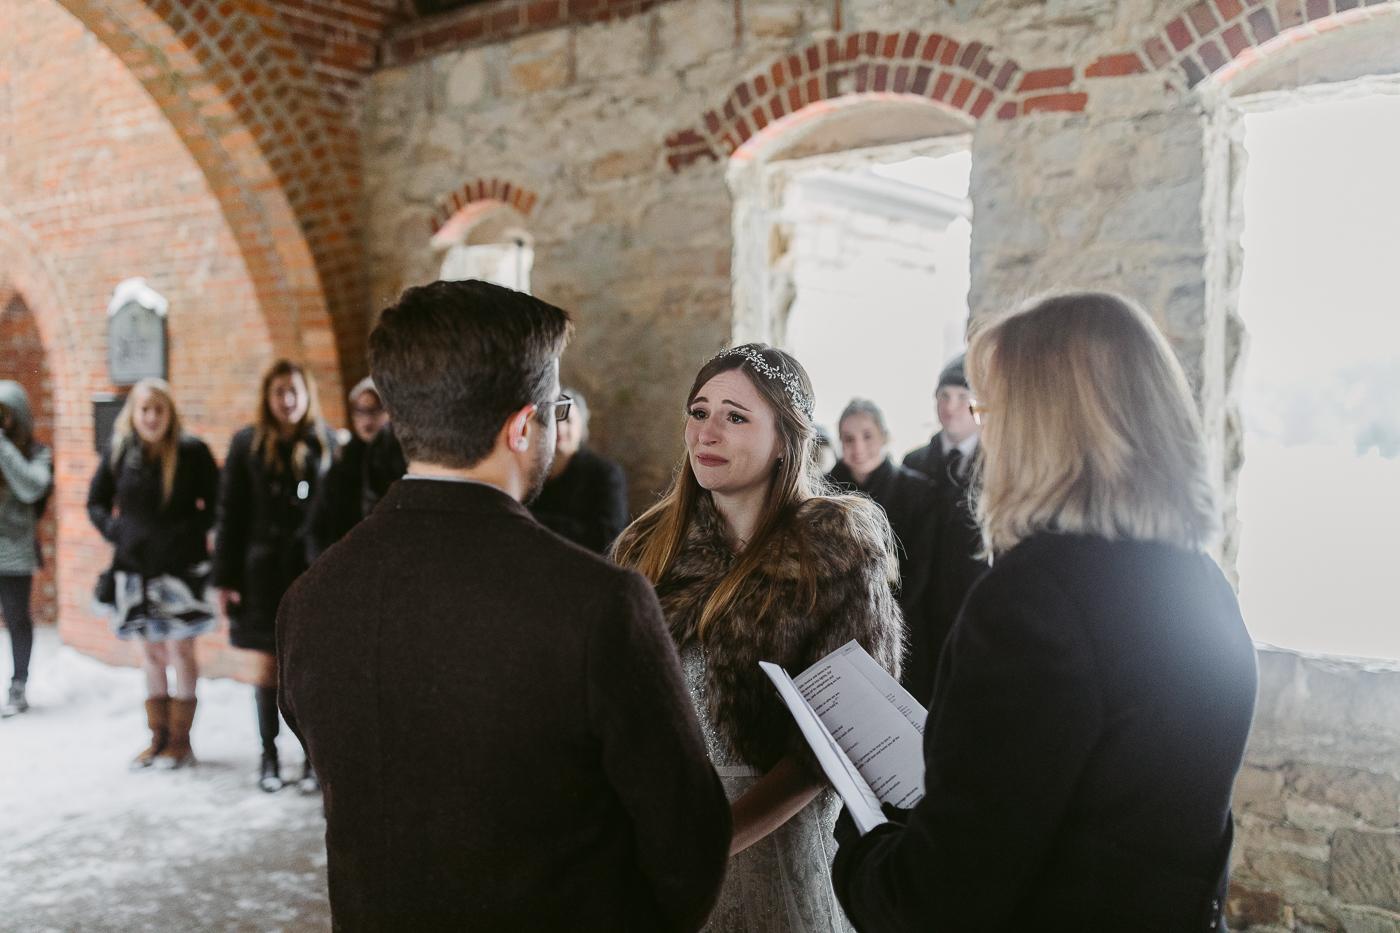 Squires-Castle-Winter-Wedding-31.jpg